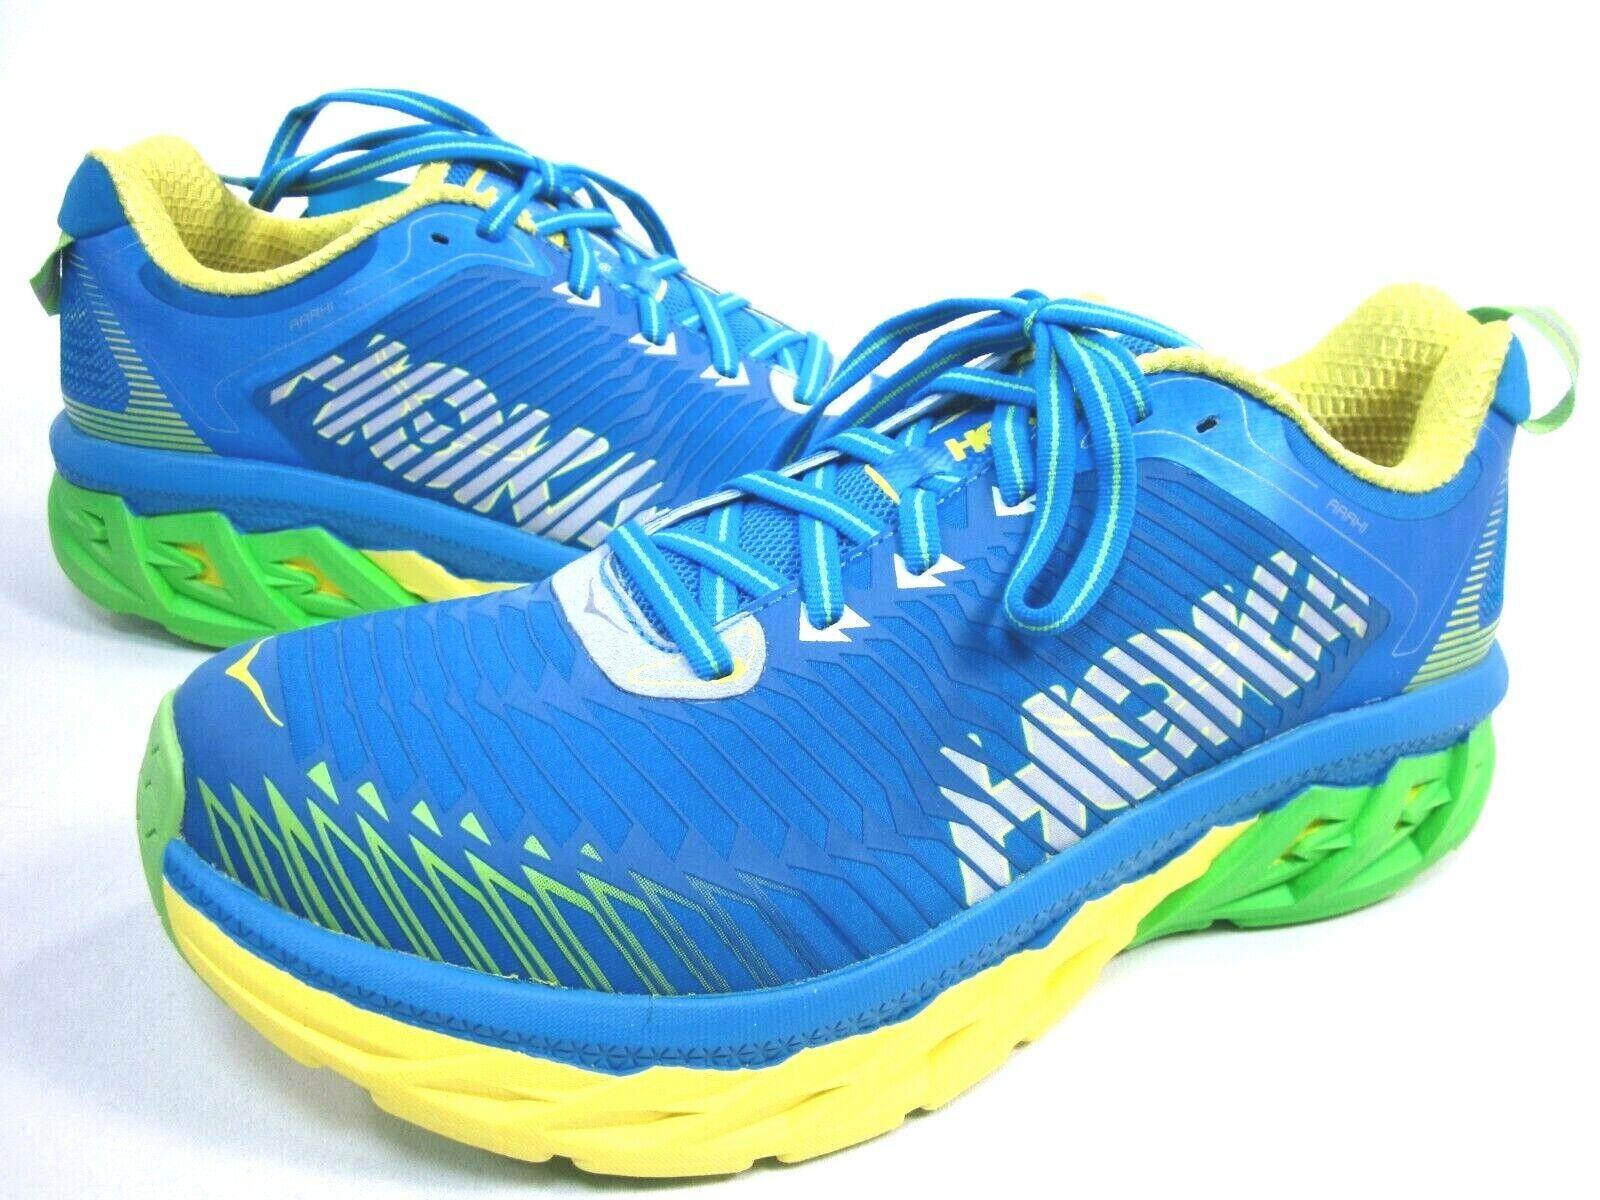 HOKA ONE ONE MEN'S ARAHI RUNNING SHOES,blueE ASTER YELLOW,US SIZE 10.5,M